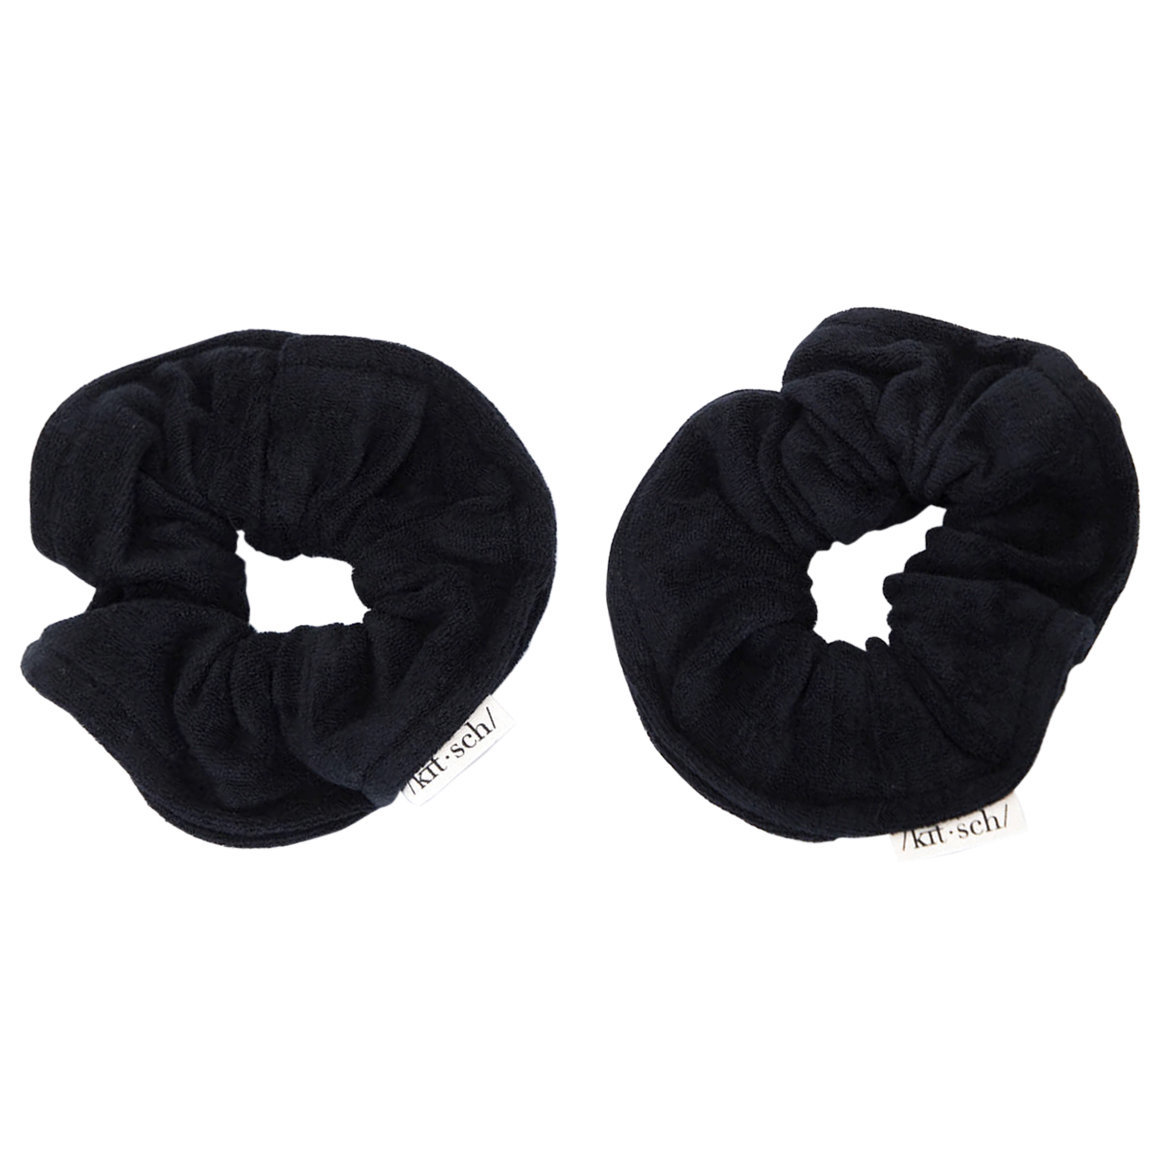 Kitsch Eco-Friendly Towel Scrunchies Black alternative view 1 - product swatch.